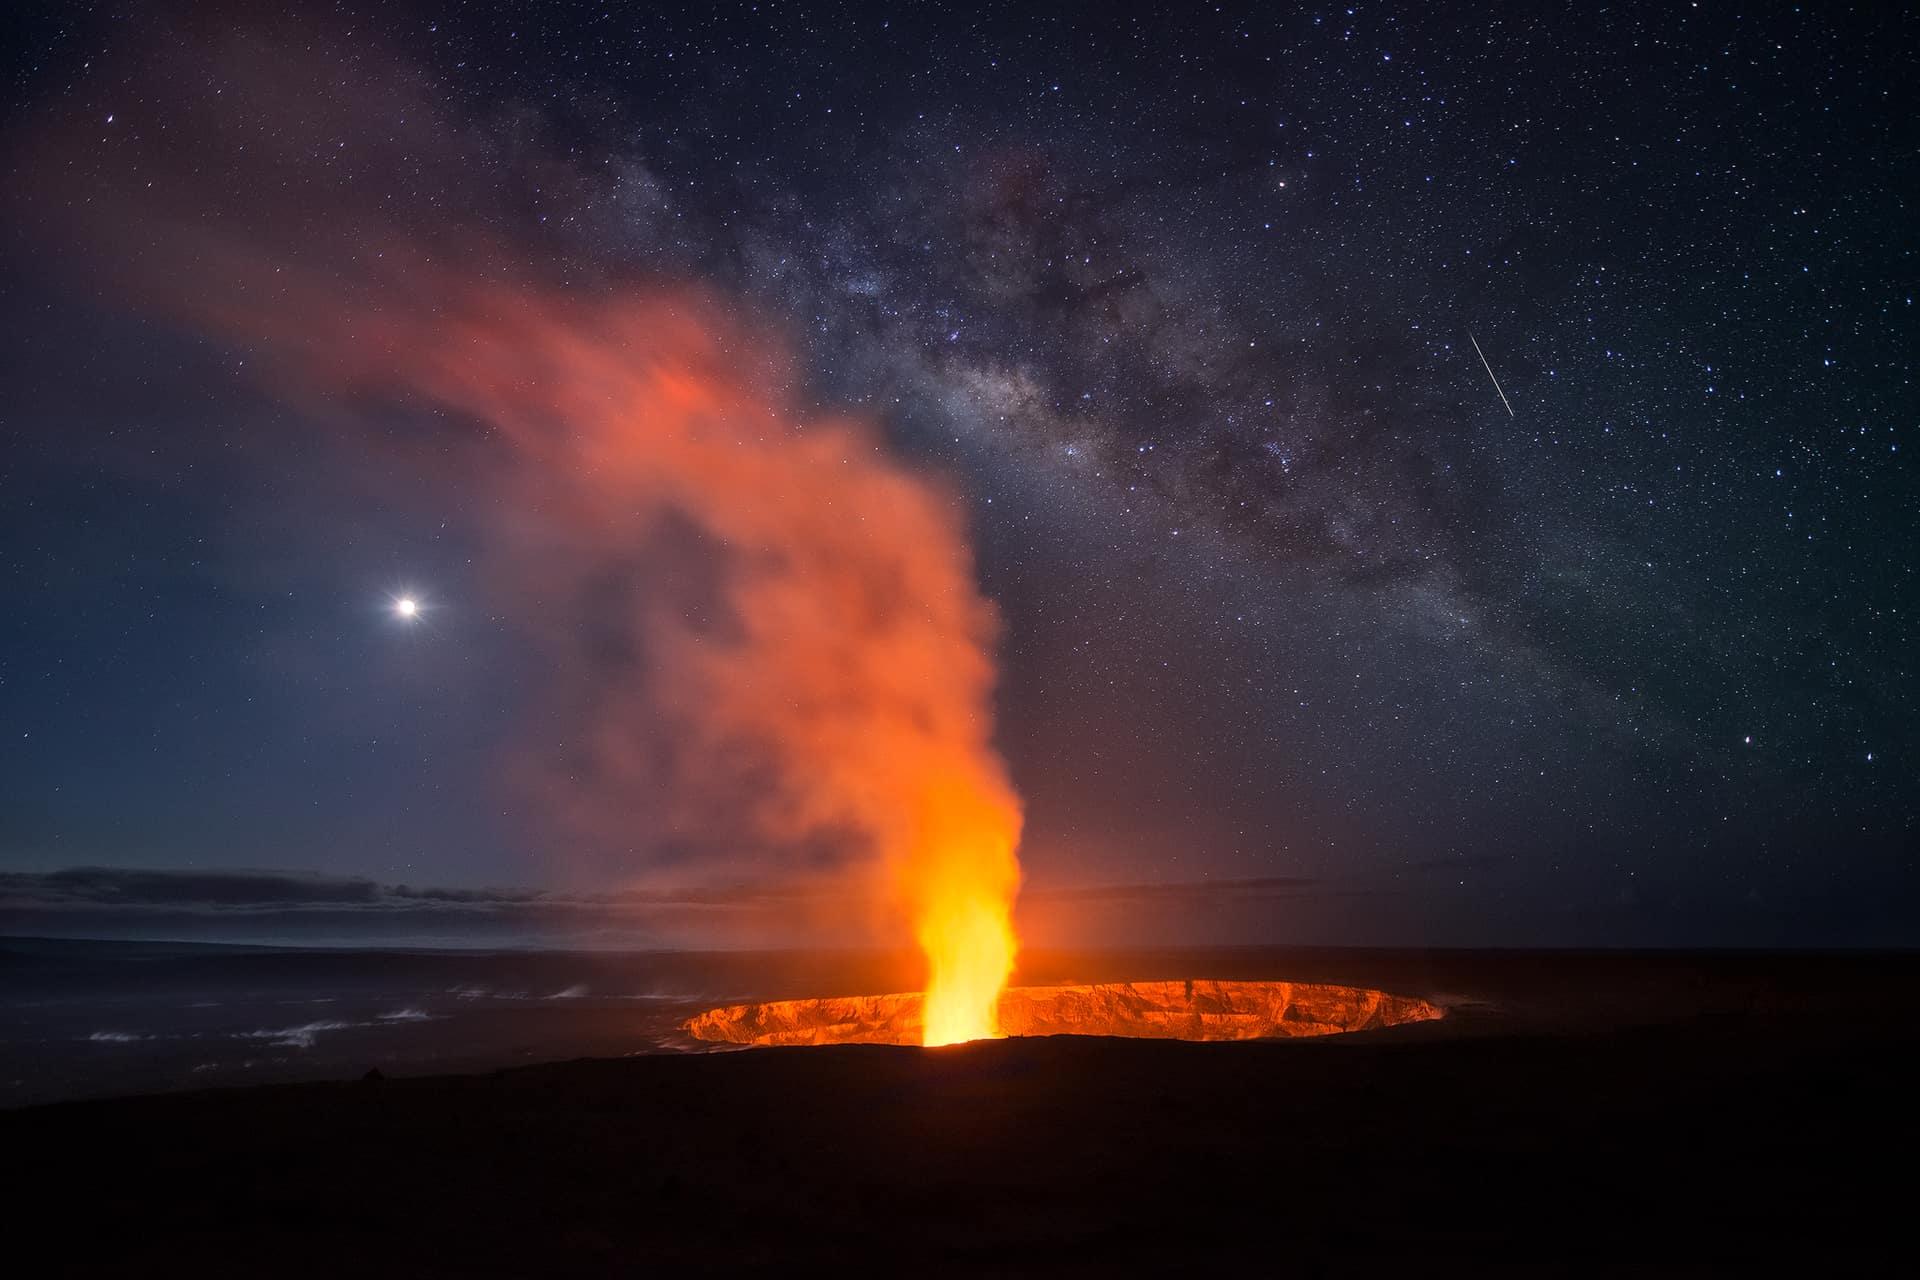 Best Milky Way images in Hawai